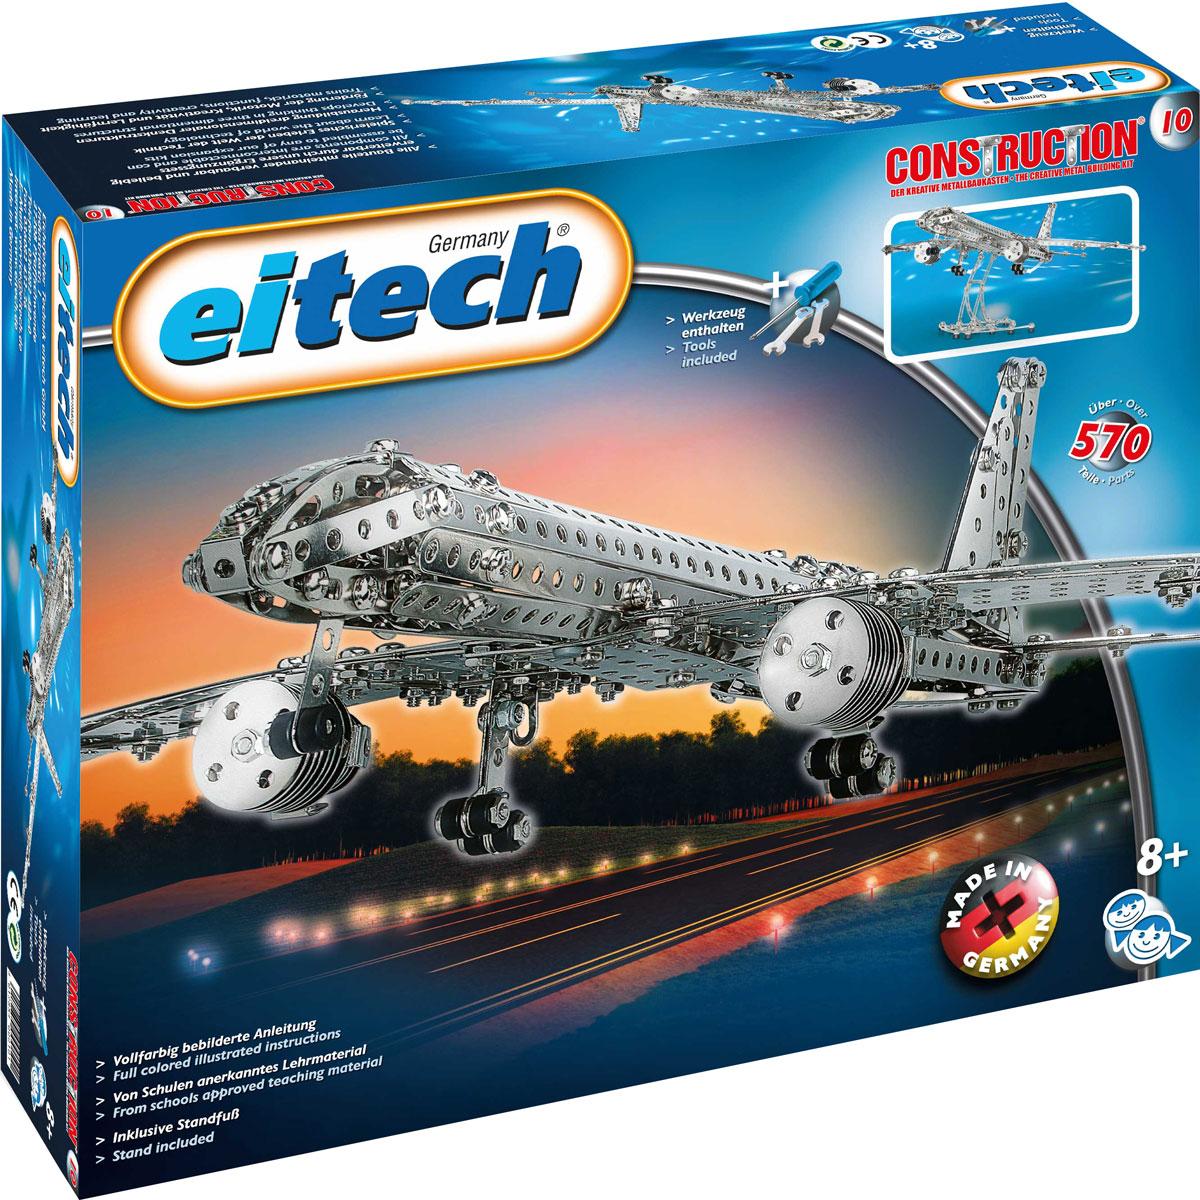 Eitech Конструктор Самолет конструкторы eitech конструктор меxаник 250 деталей